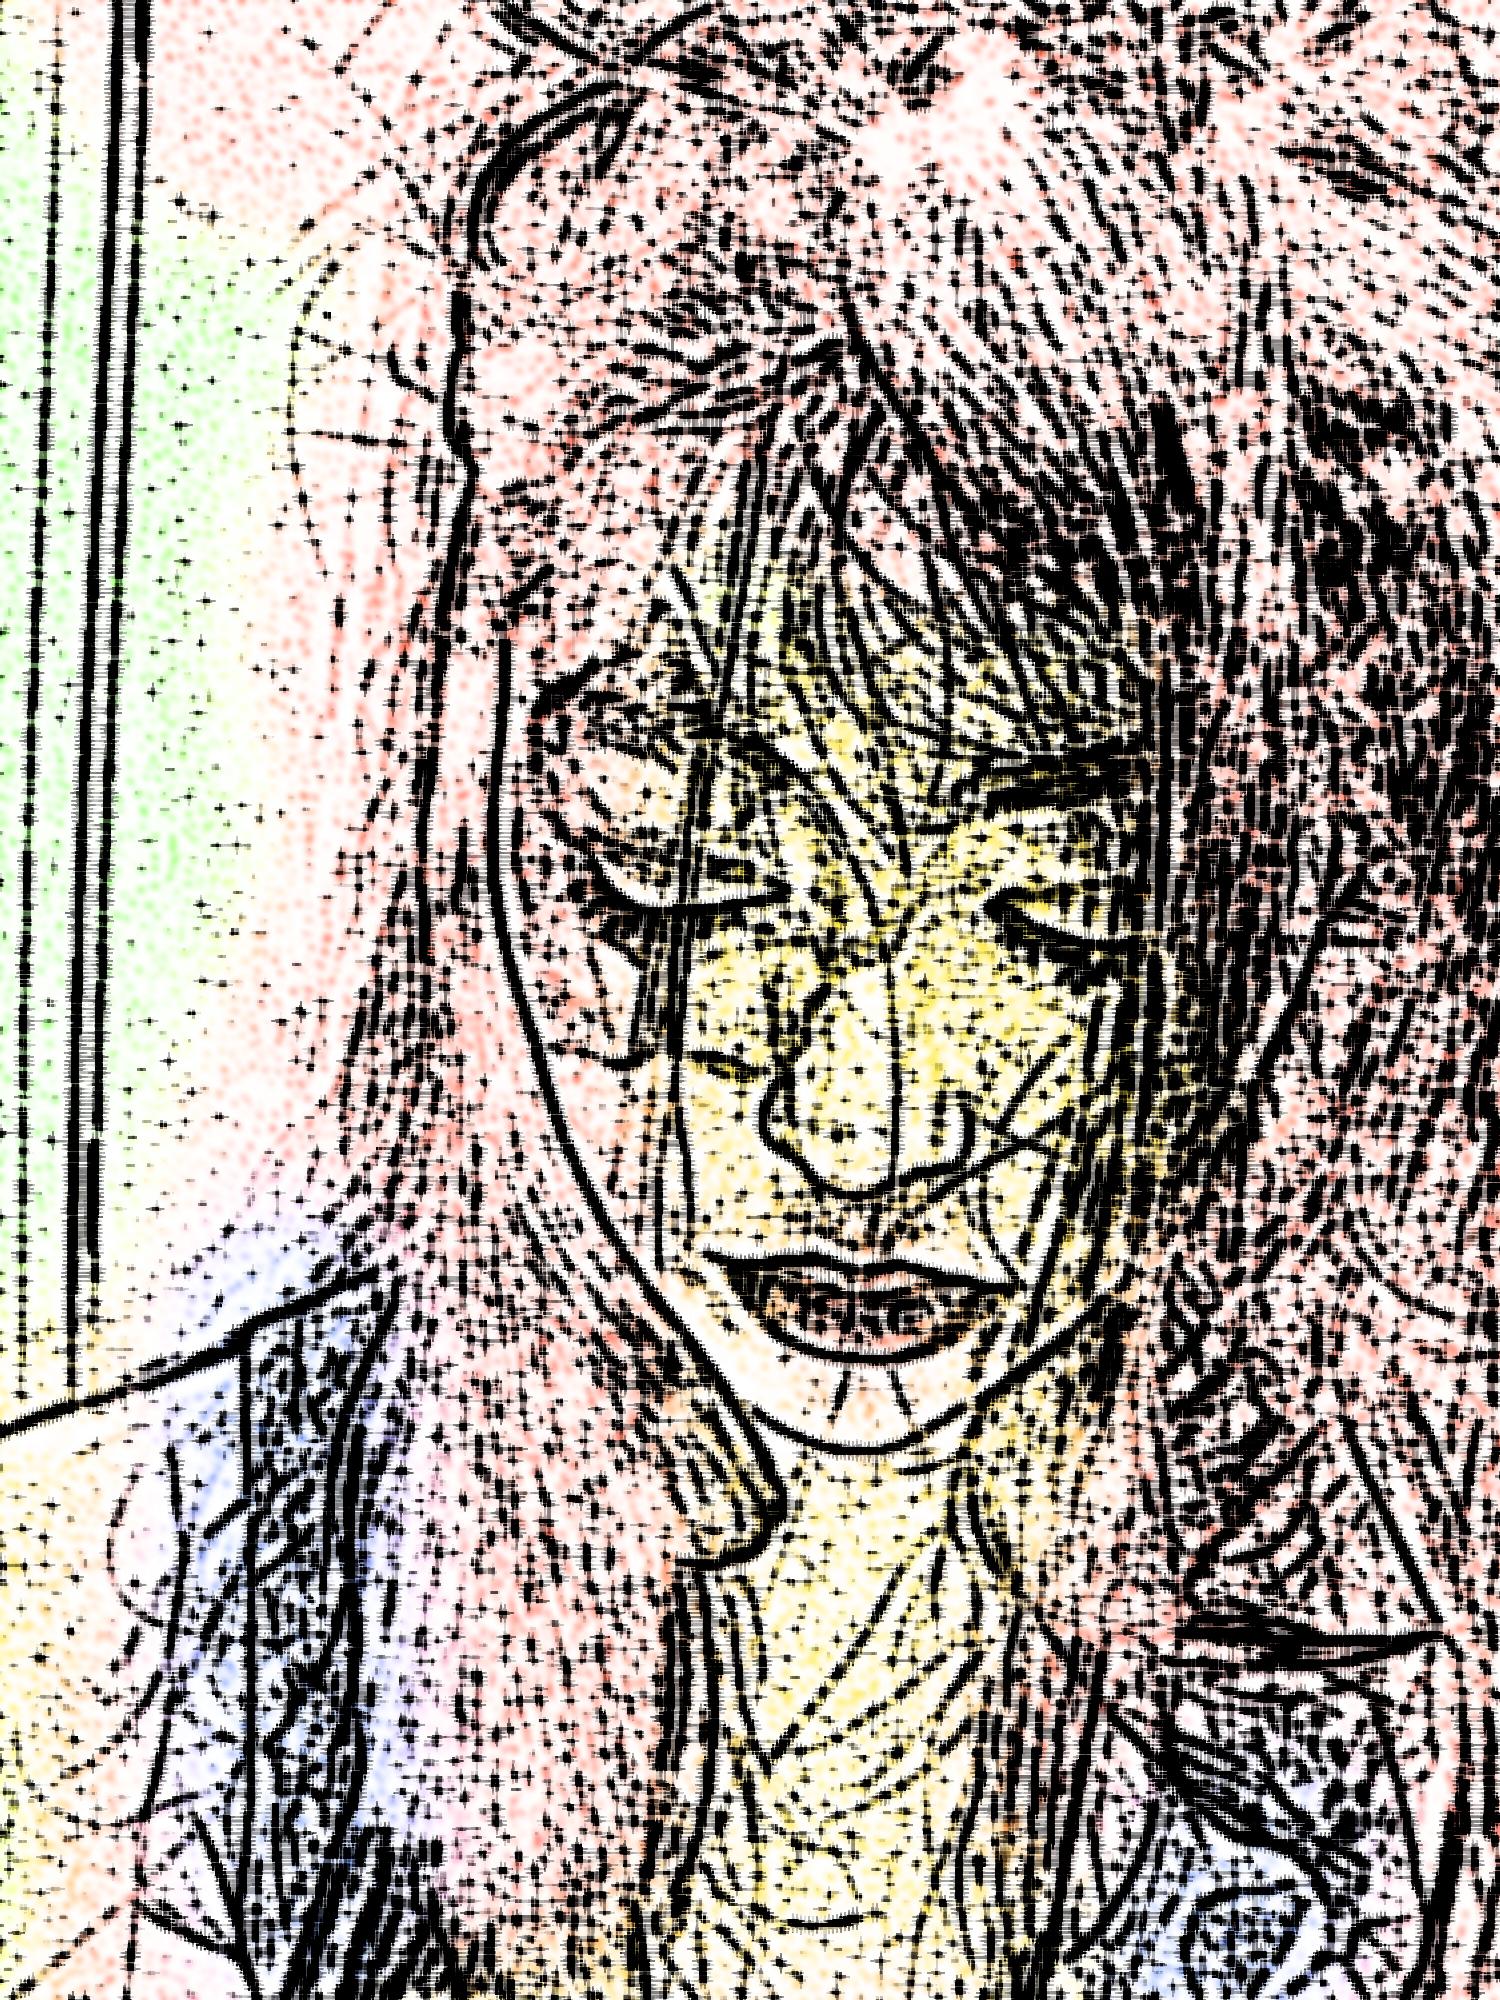 a sloppy self portrait